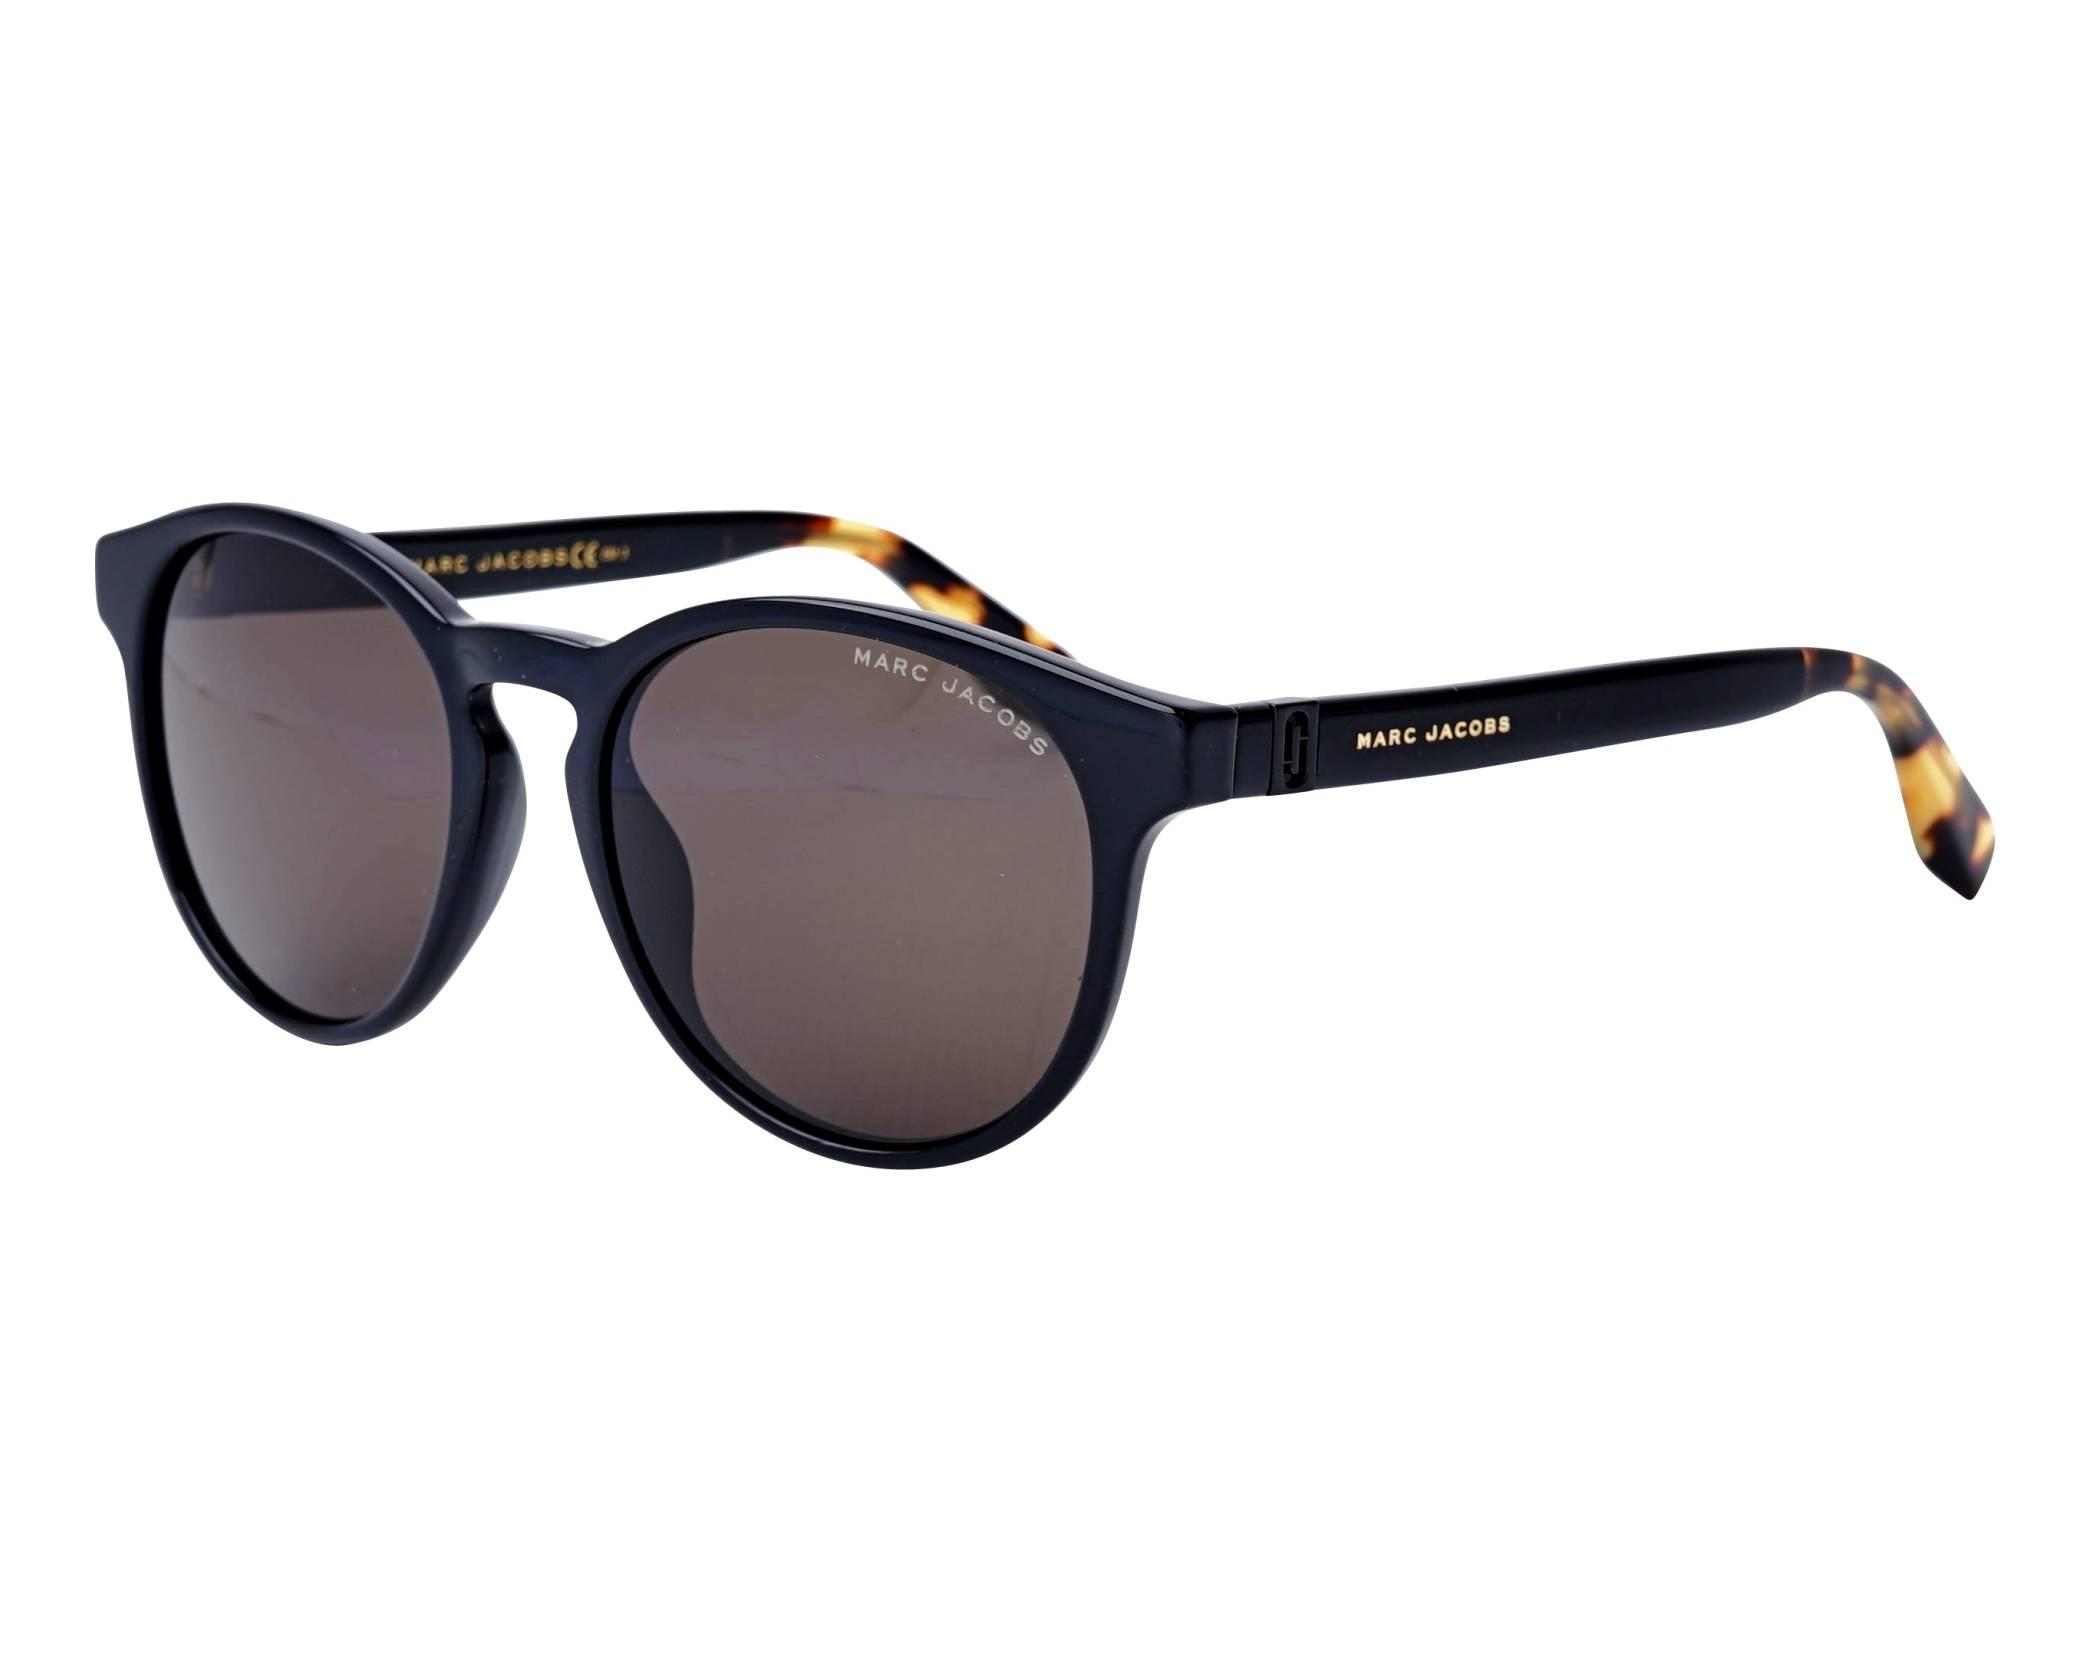 fa4597f48f2 Sunglasses Marc Jacobs MARC-351-S 807IR 52-19 Black profile view